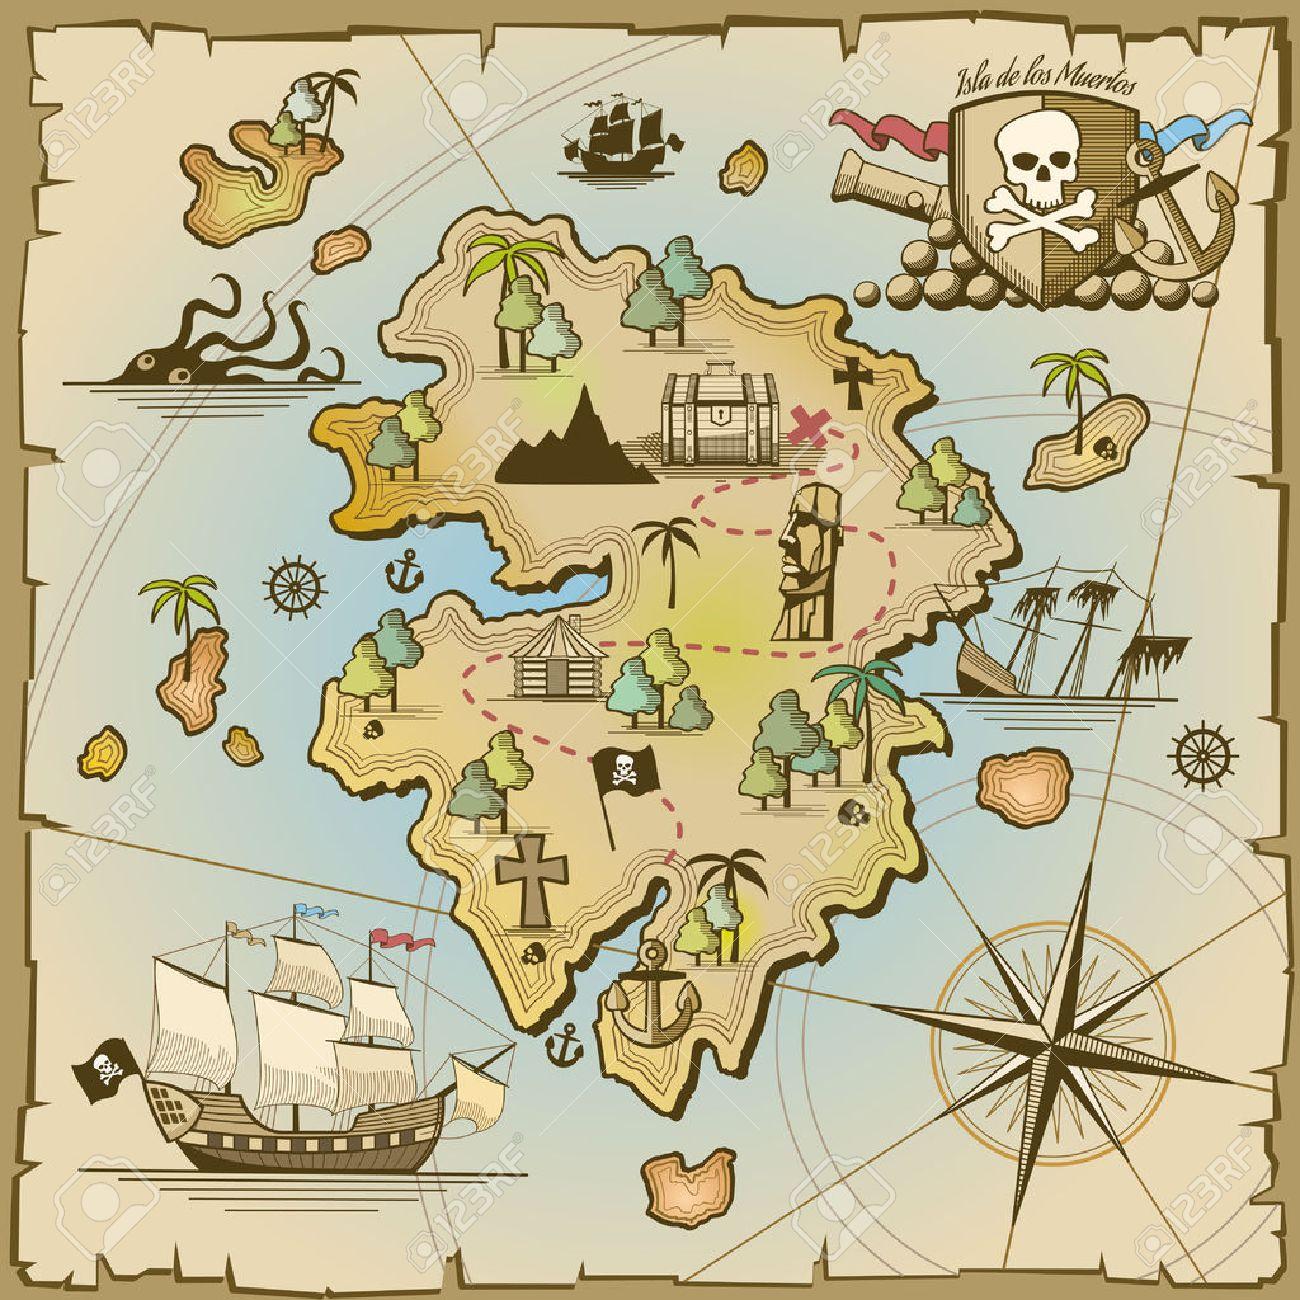 Pirate treasure island vector map. Sea ship, adventure ocean, skull and paper, navigation art and cannon illustration - 47419724